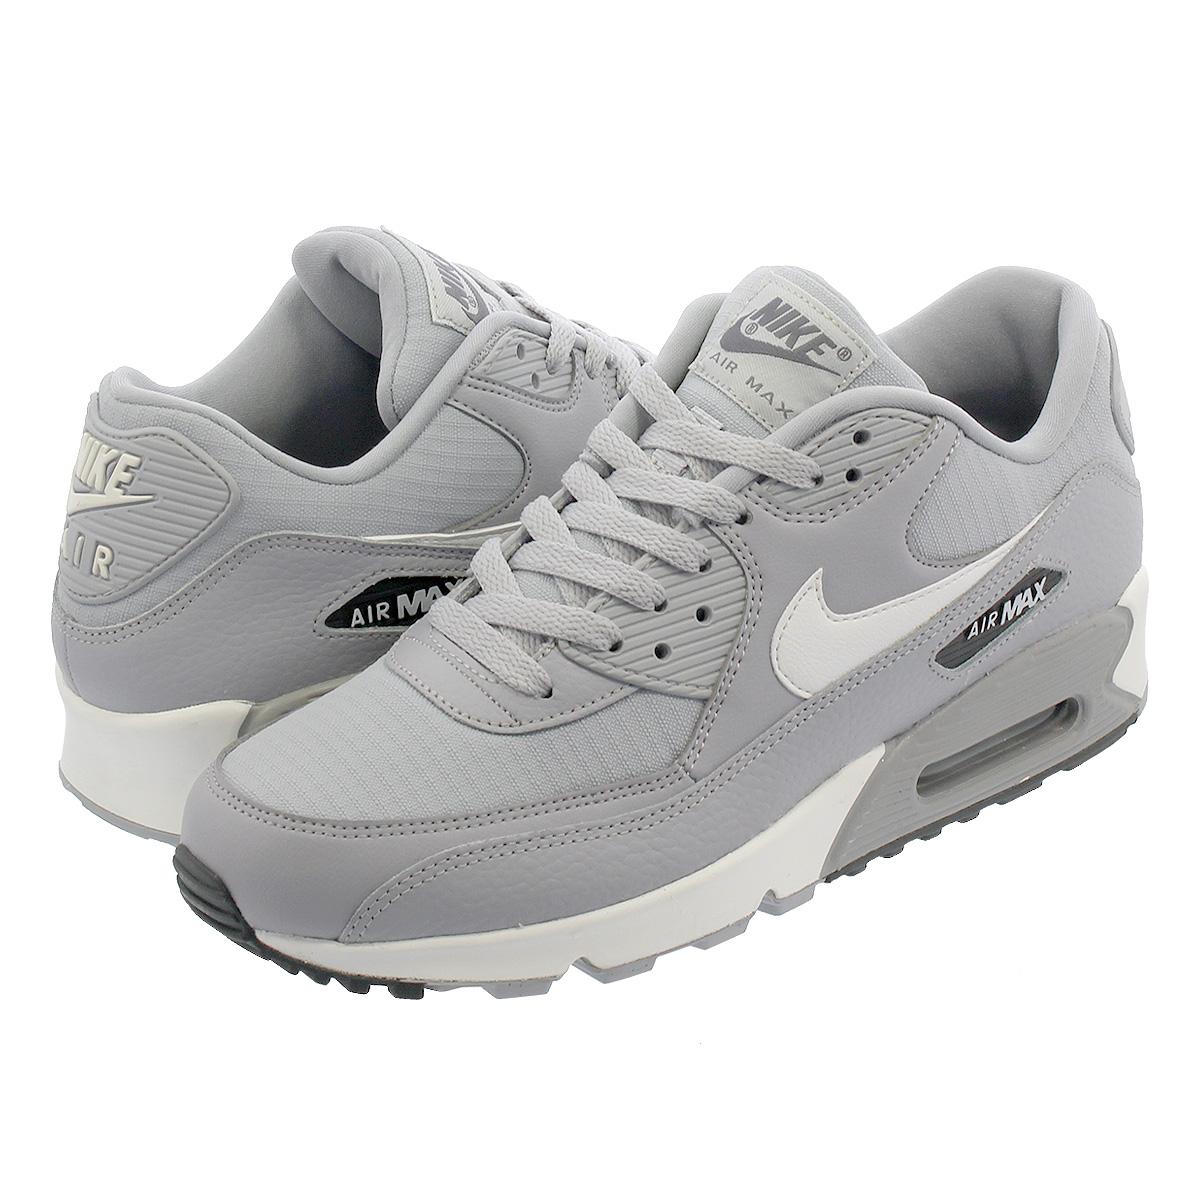 promo code 40b0b d9743 NIKE WMNS AIR MAX 90 Nike women Air Max 90 WOLF GREY/SUMMIT WHITE/DARK GREY  325,213-062